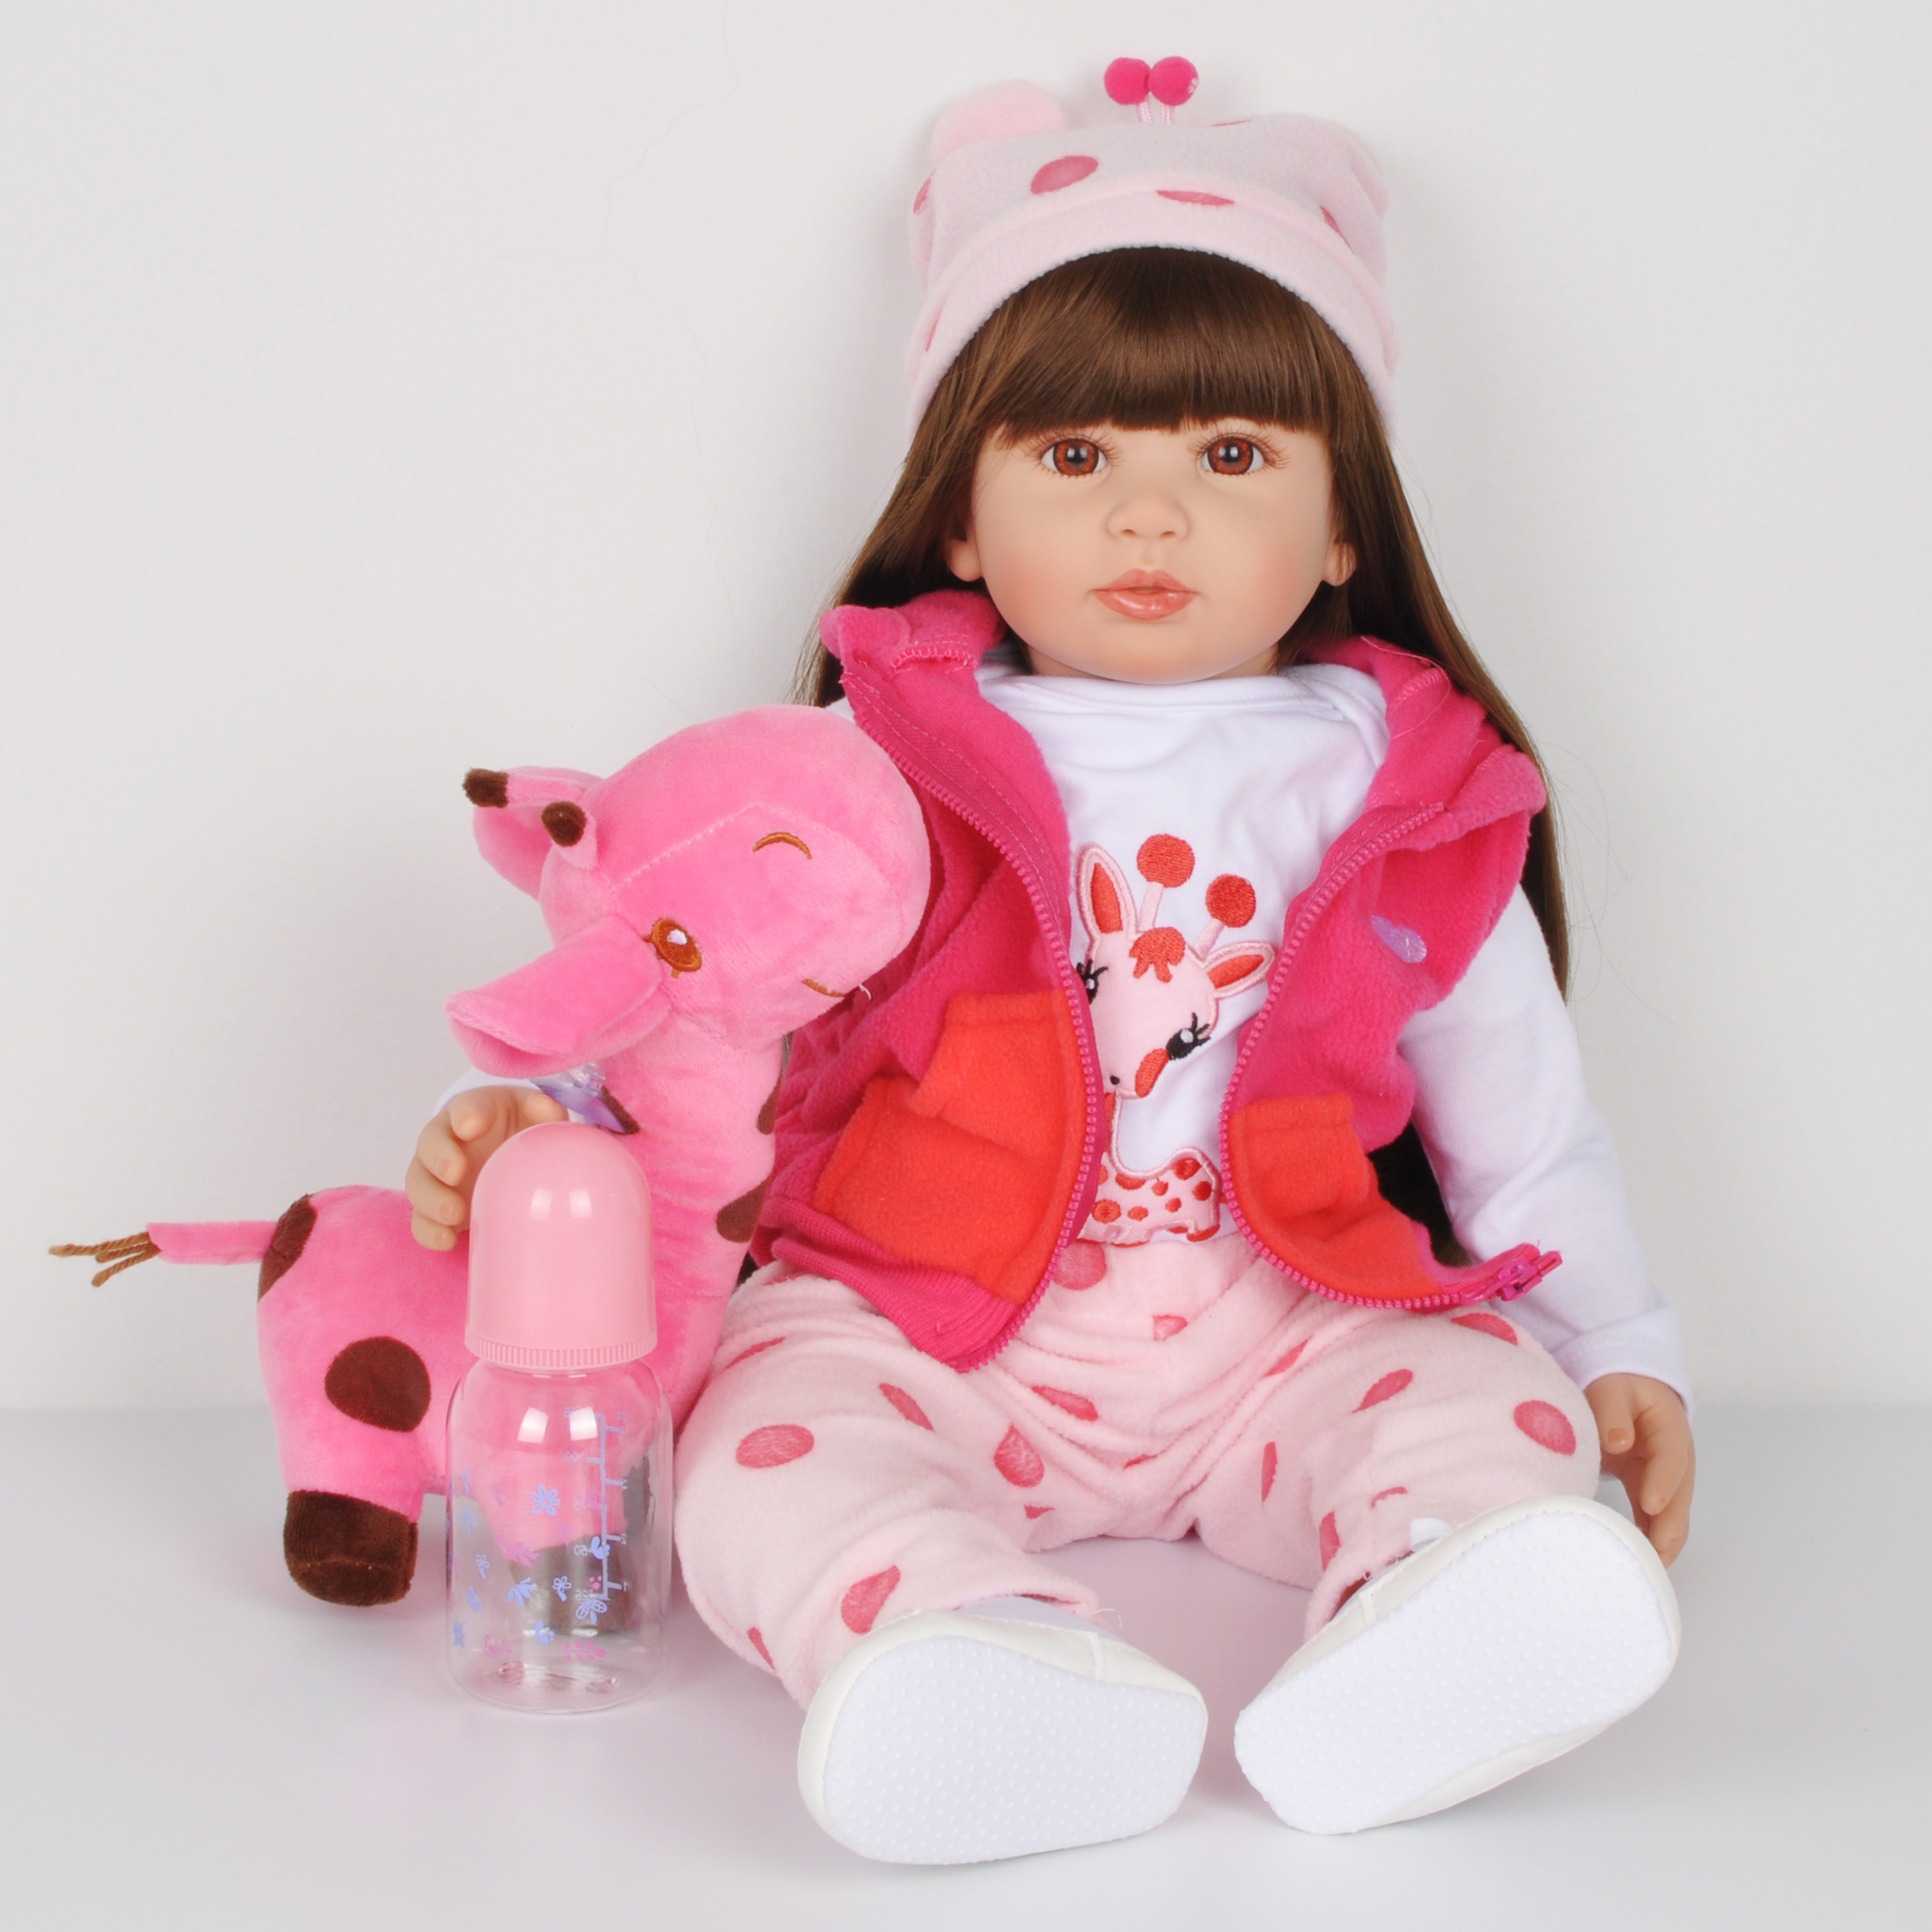 24inch 60cm Reborn Baby Doll Silicone Bebe Bonecas Lifelike Realistic Alive Baby Menino Christmas Gift Toys Long Hair Giraffe